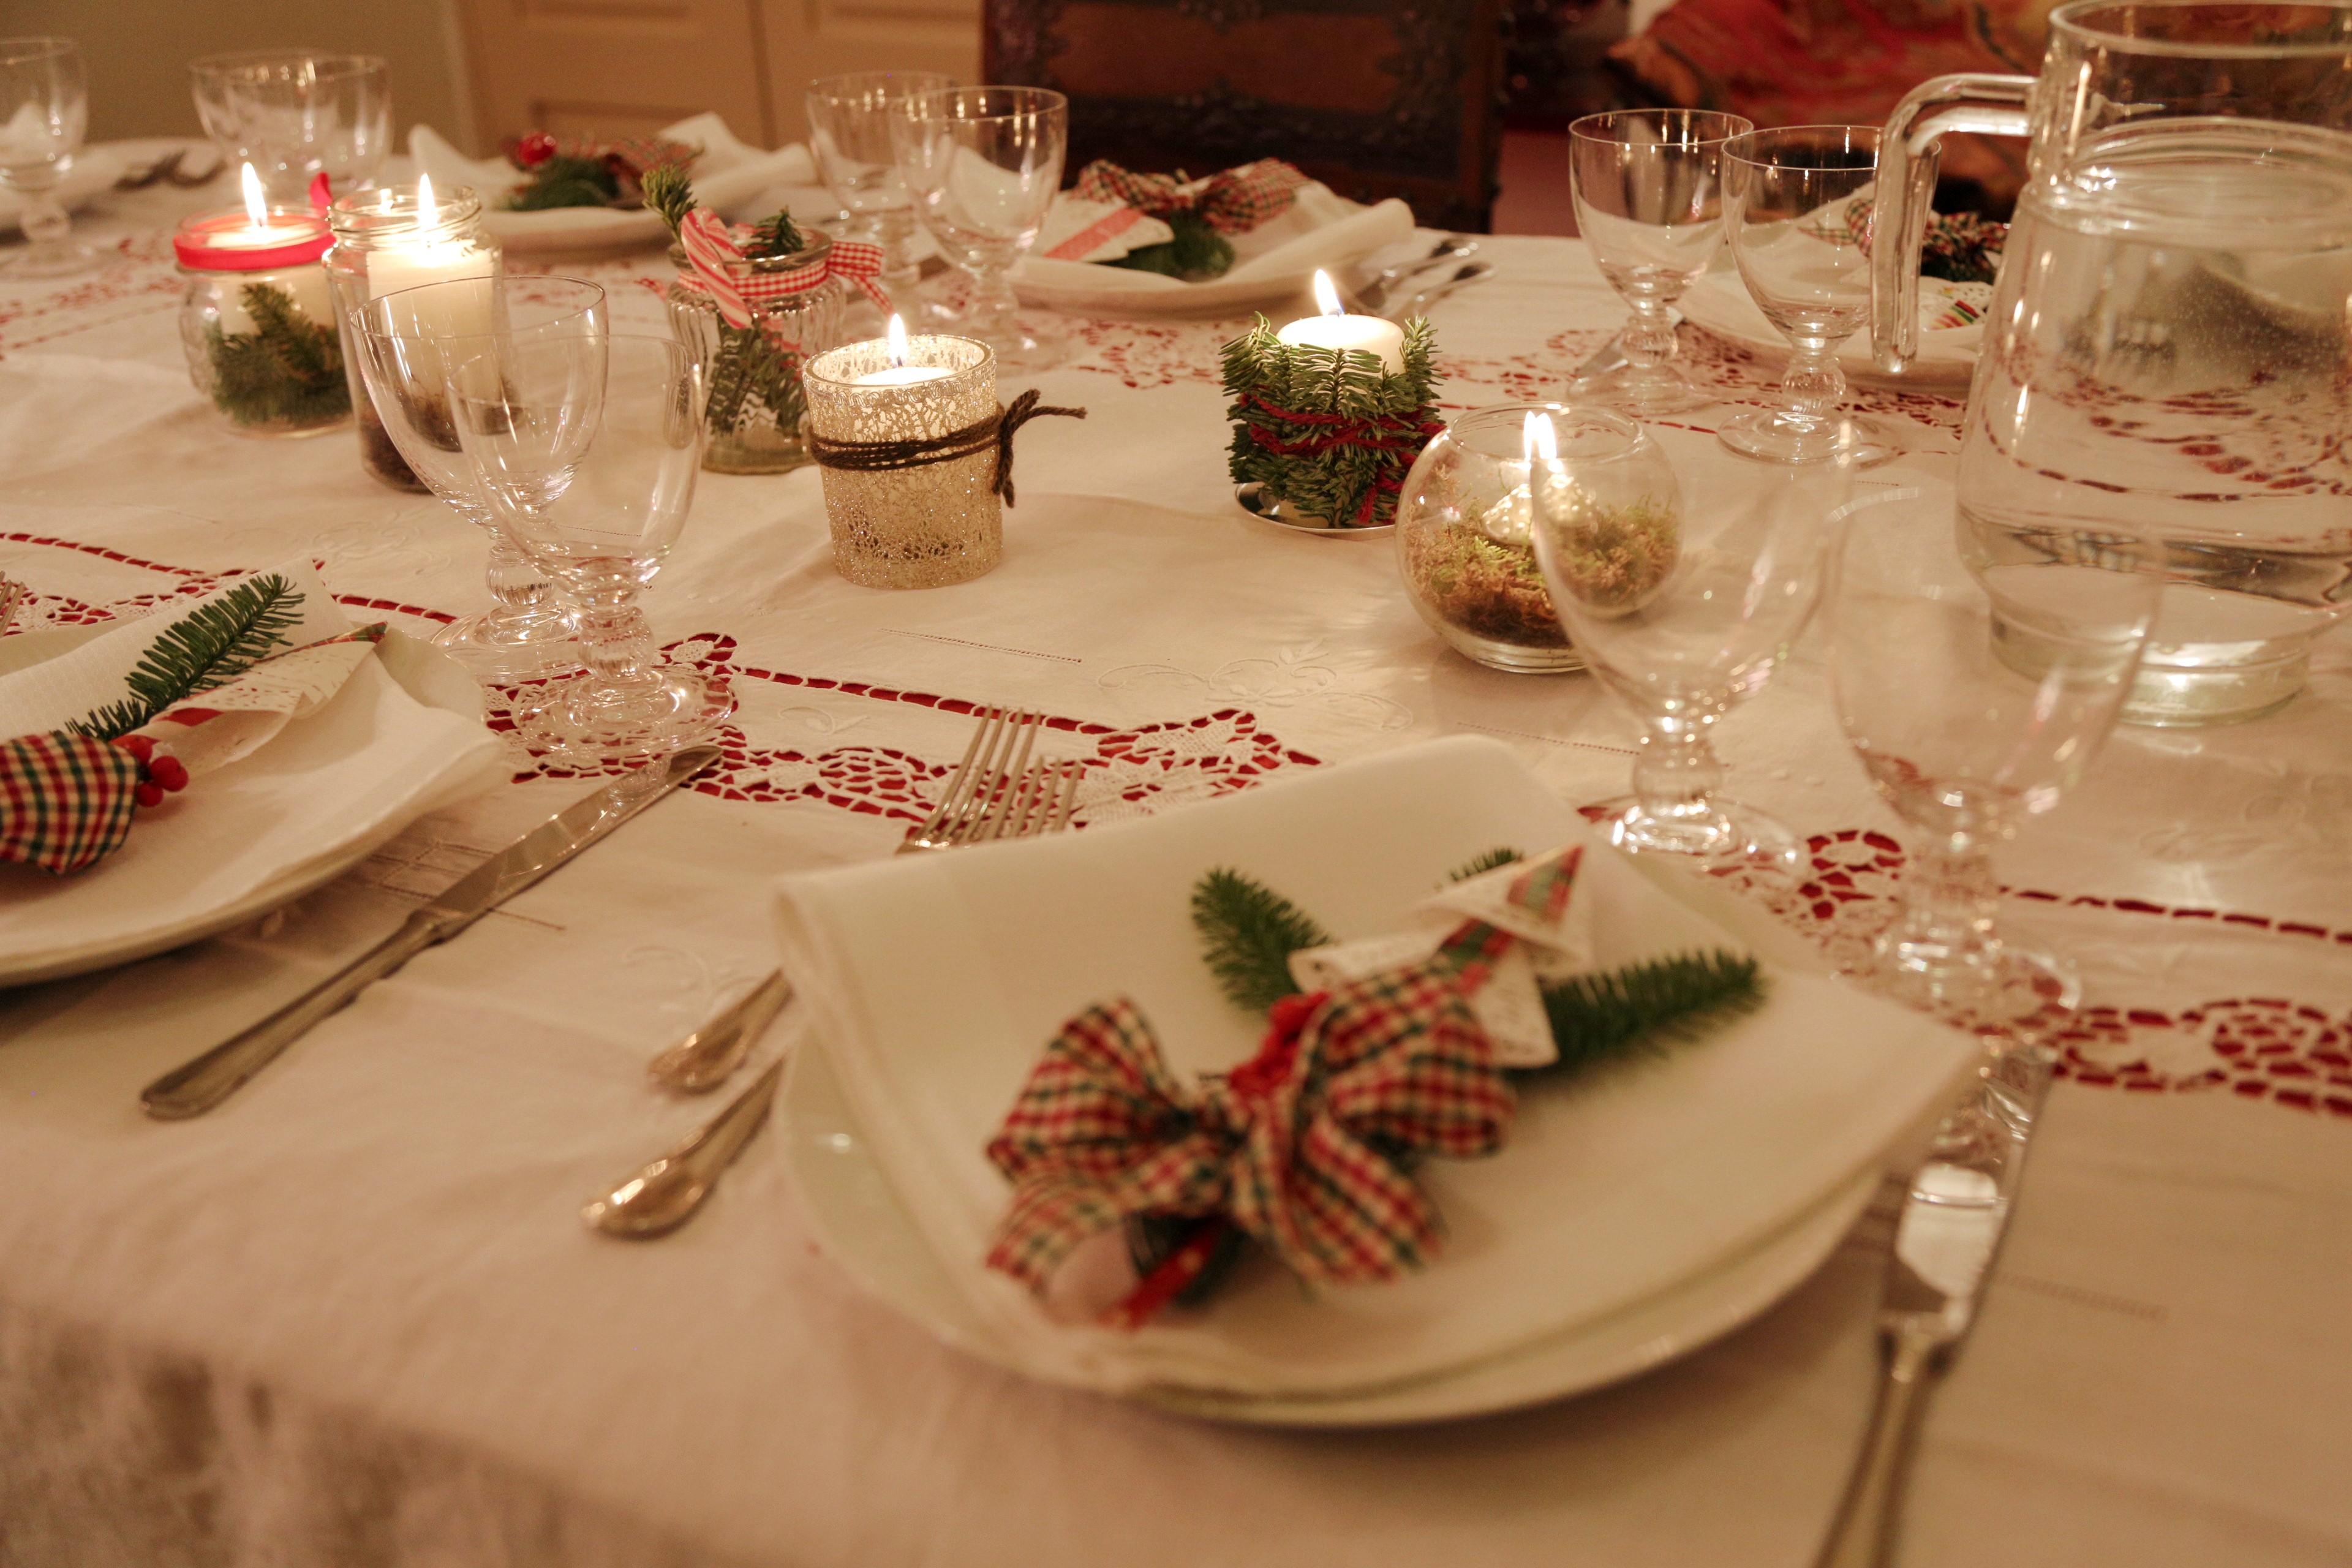 La tavola di natale tra papille e sentimenti edo blog - Addobbi natalizi per tavola da pranzo ...